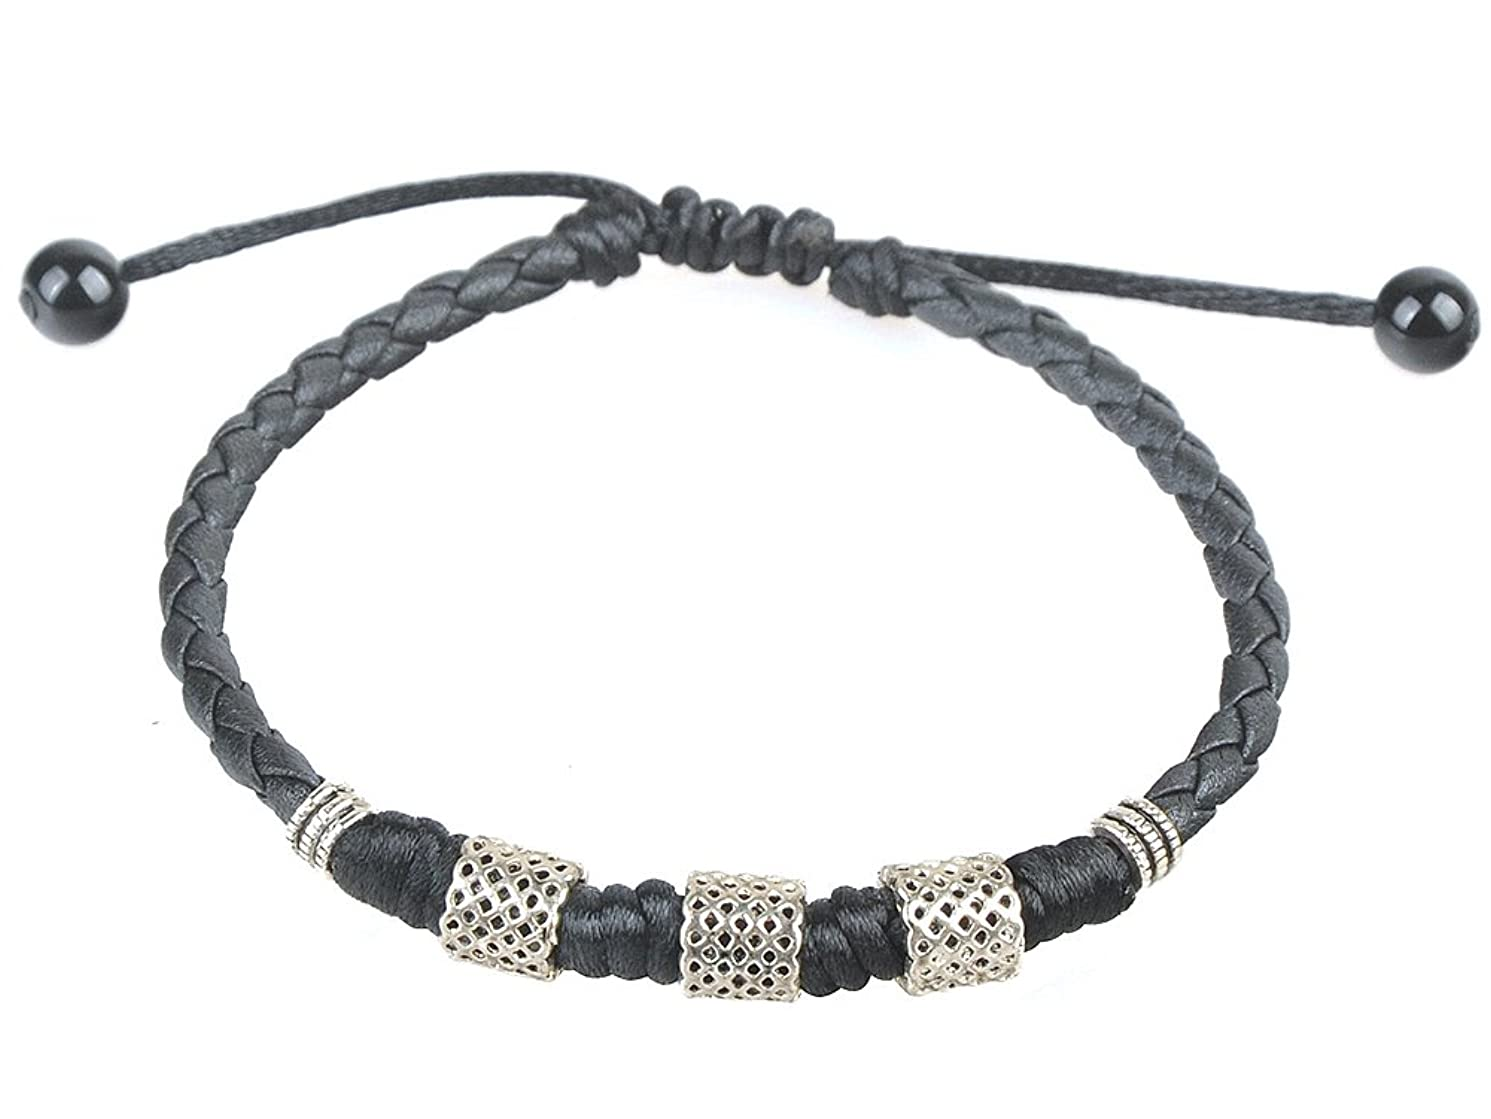 Ancient Tribe Handmade Adjustable Black Leather Anklet